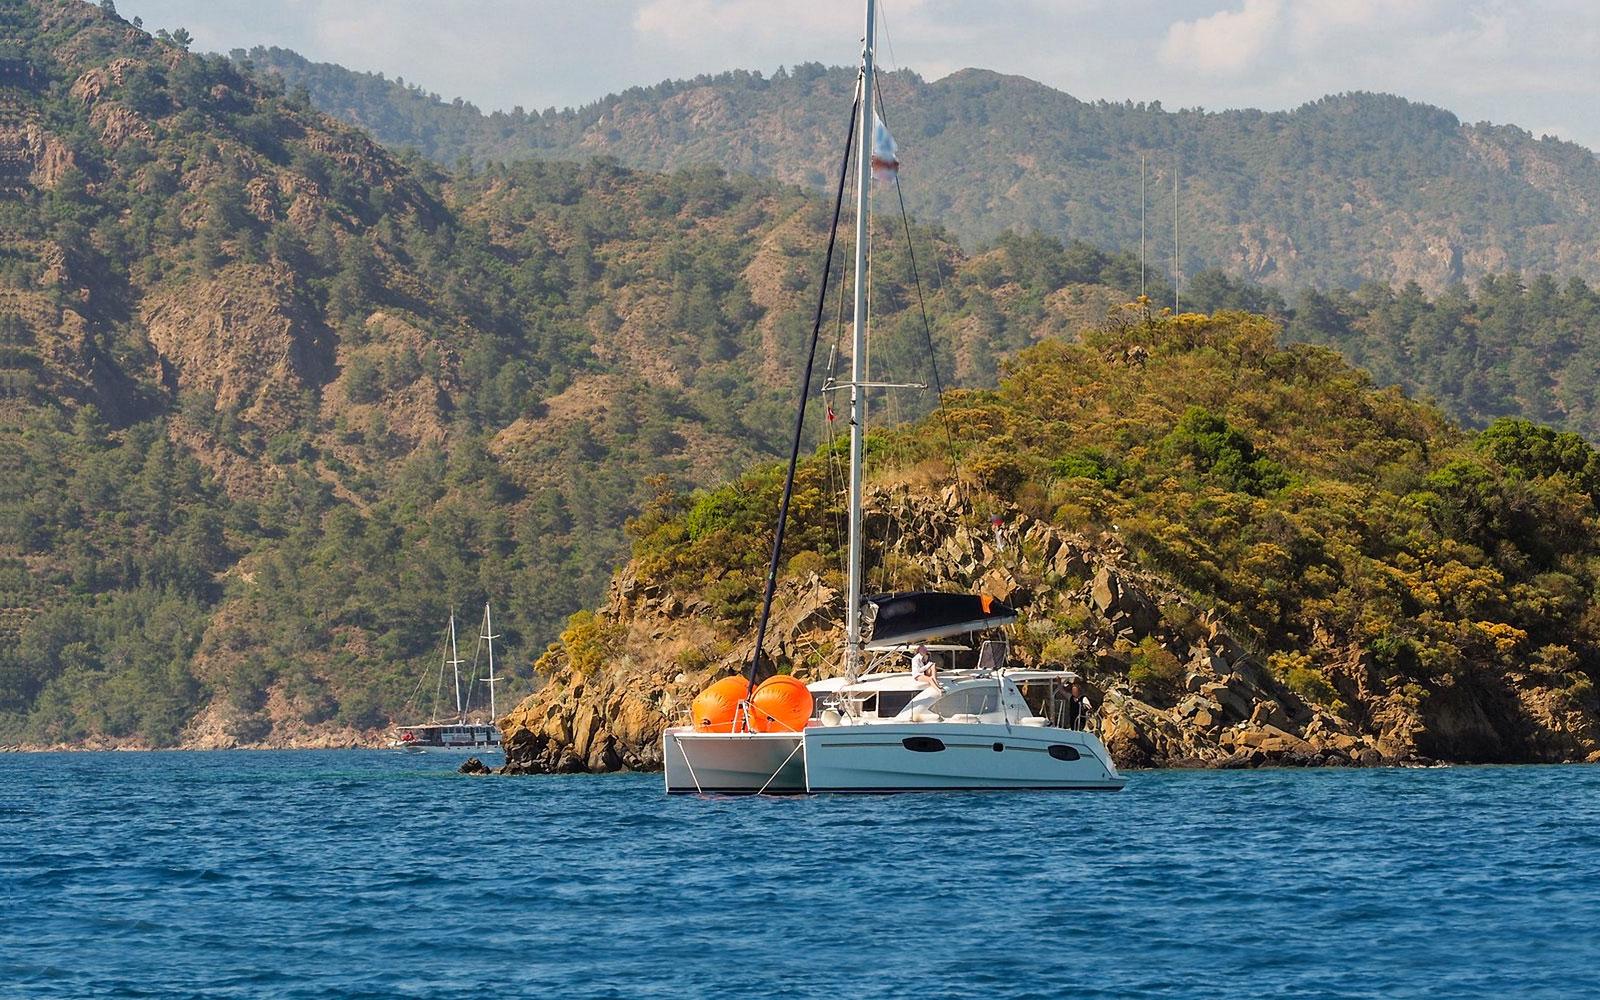 Have Catamaran tour in Costa Rica